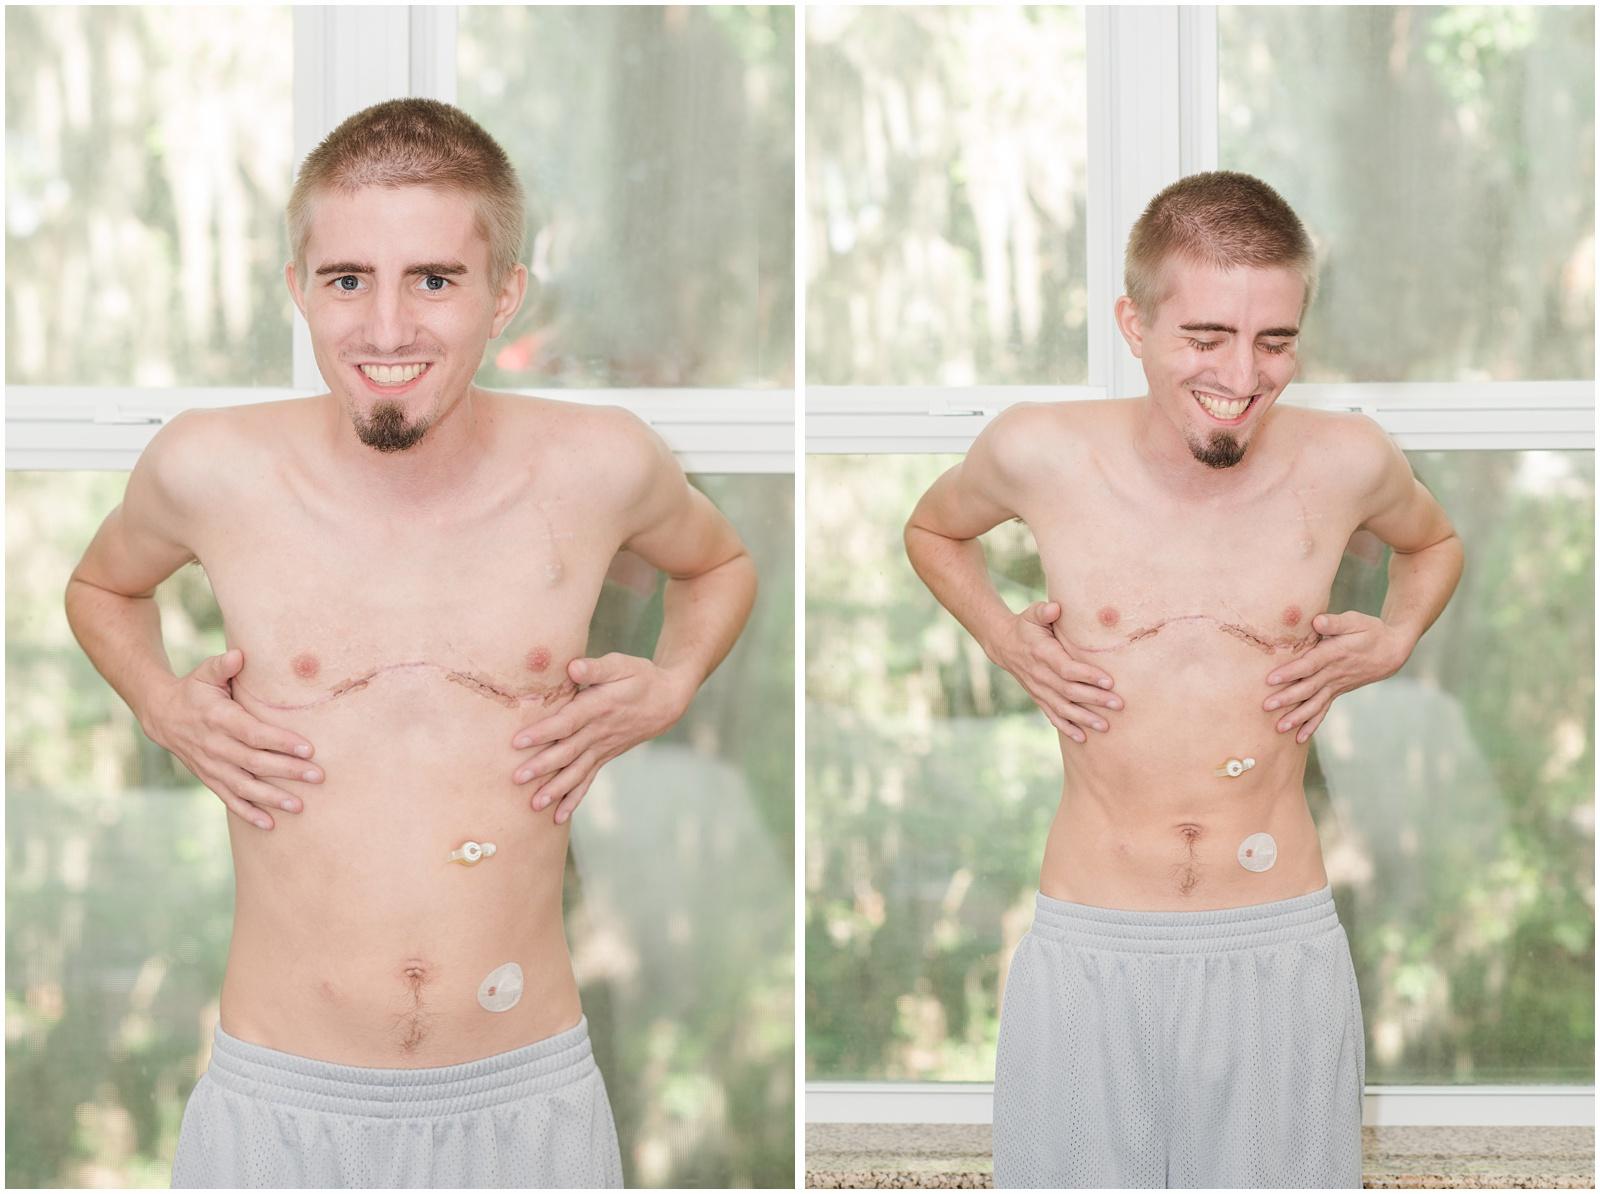 Lung_Transplant_Shands_Hospital_Cystic_Fibrosis_10.jpg